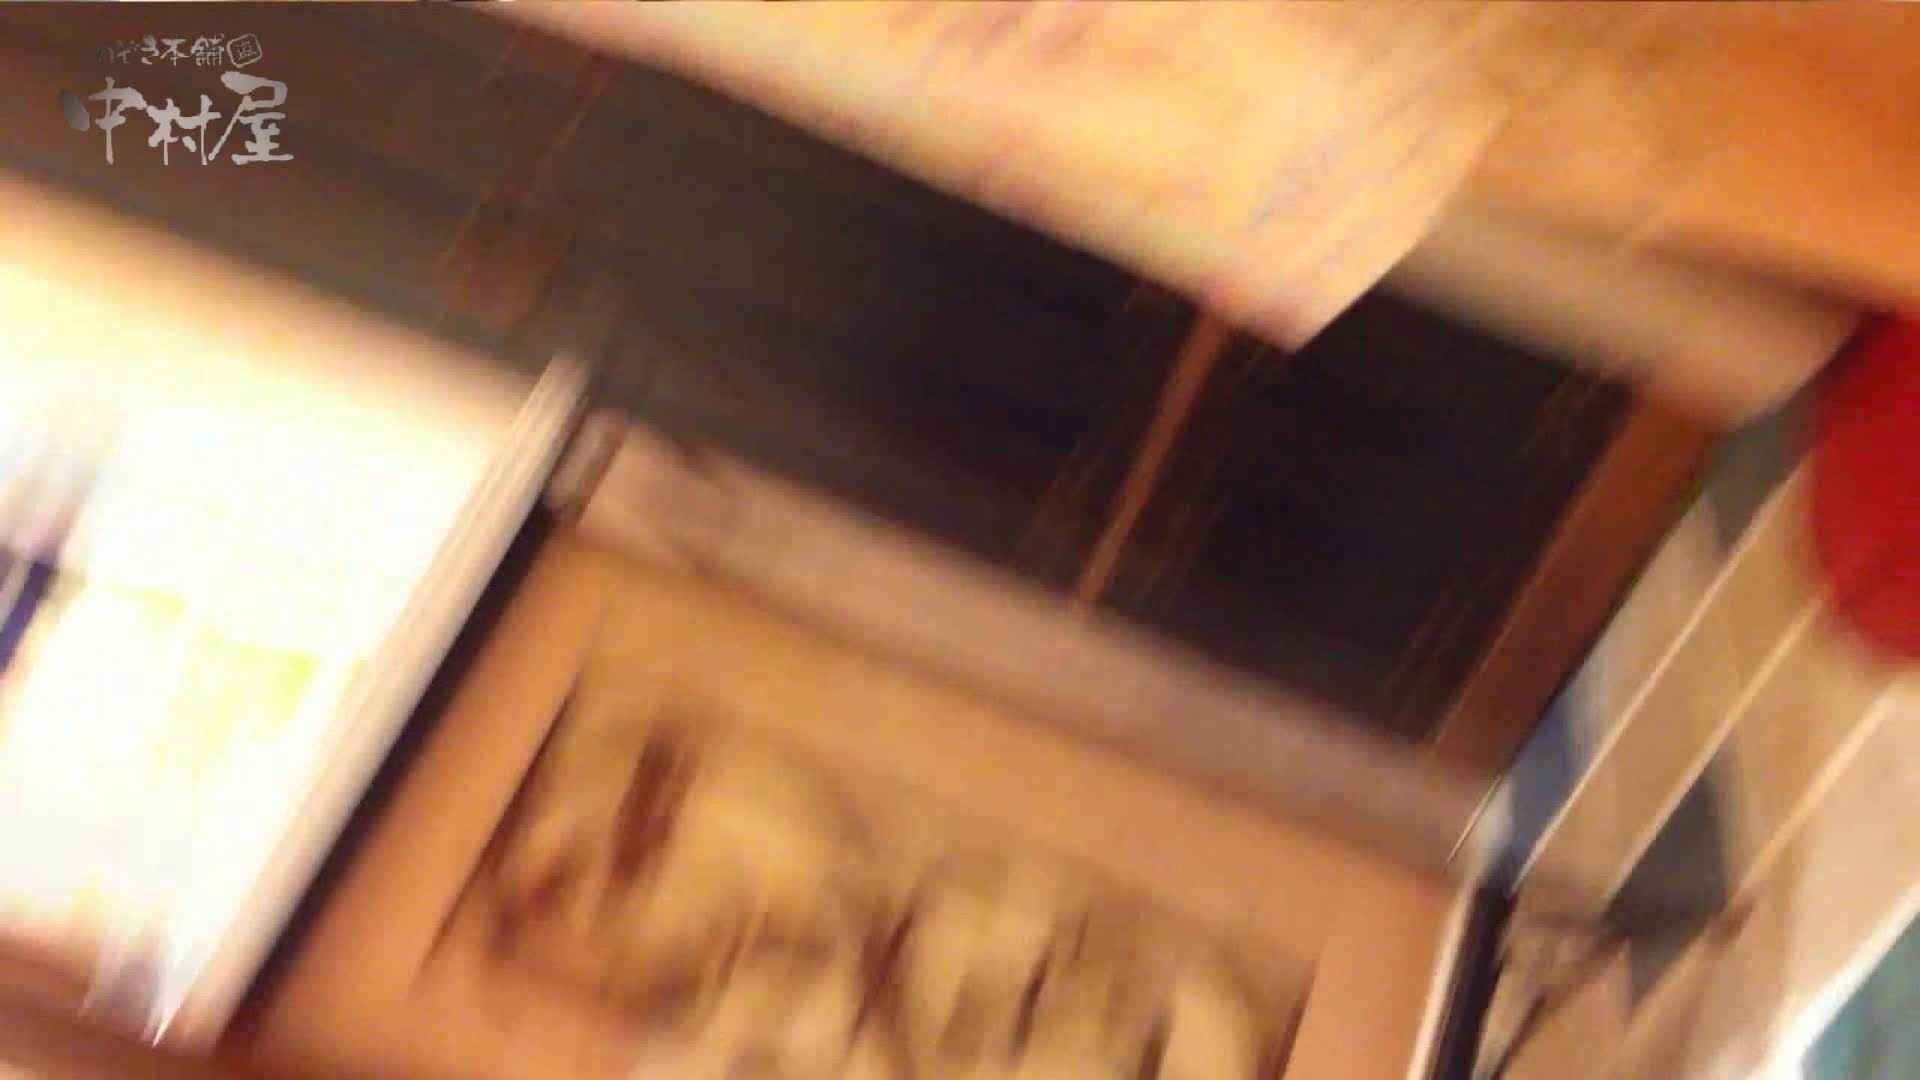 vol.69 美人アパレル胸チラ&パンチラ ストライプパンツみっけ! 接写 ぱこり動画紹介 53枚 23